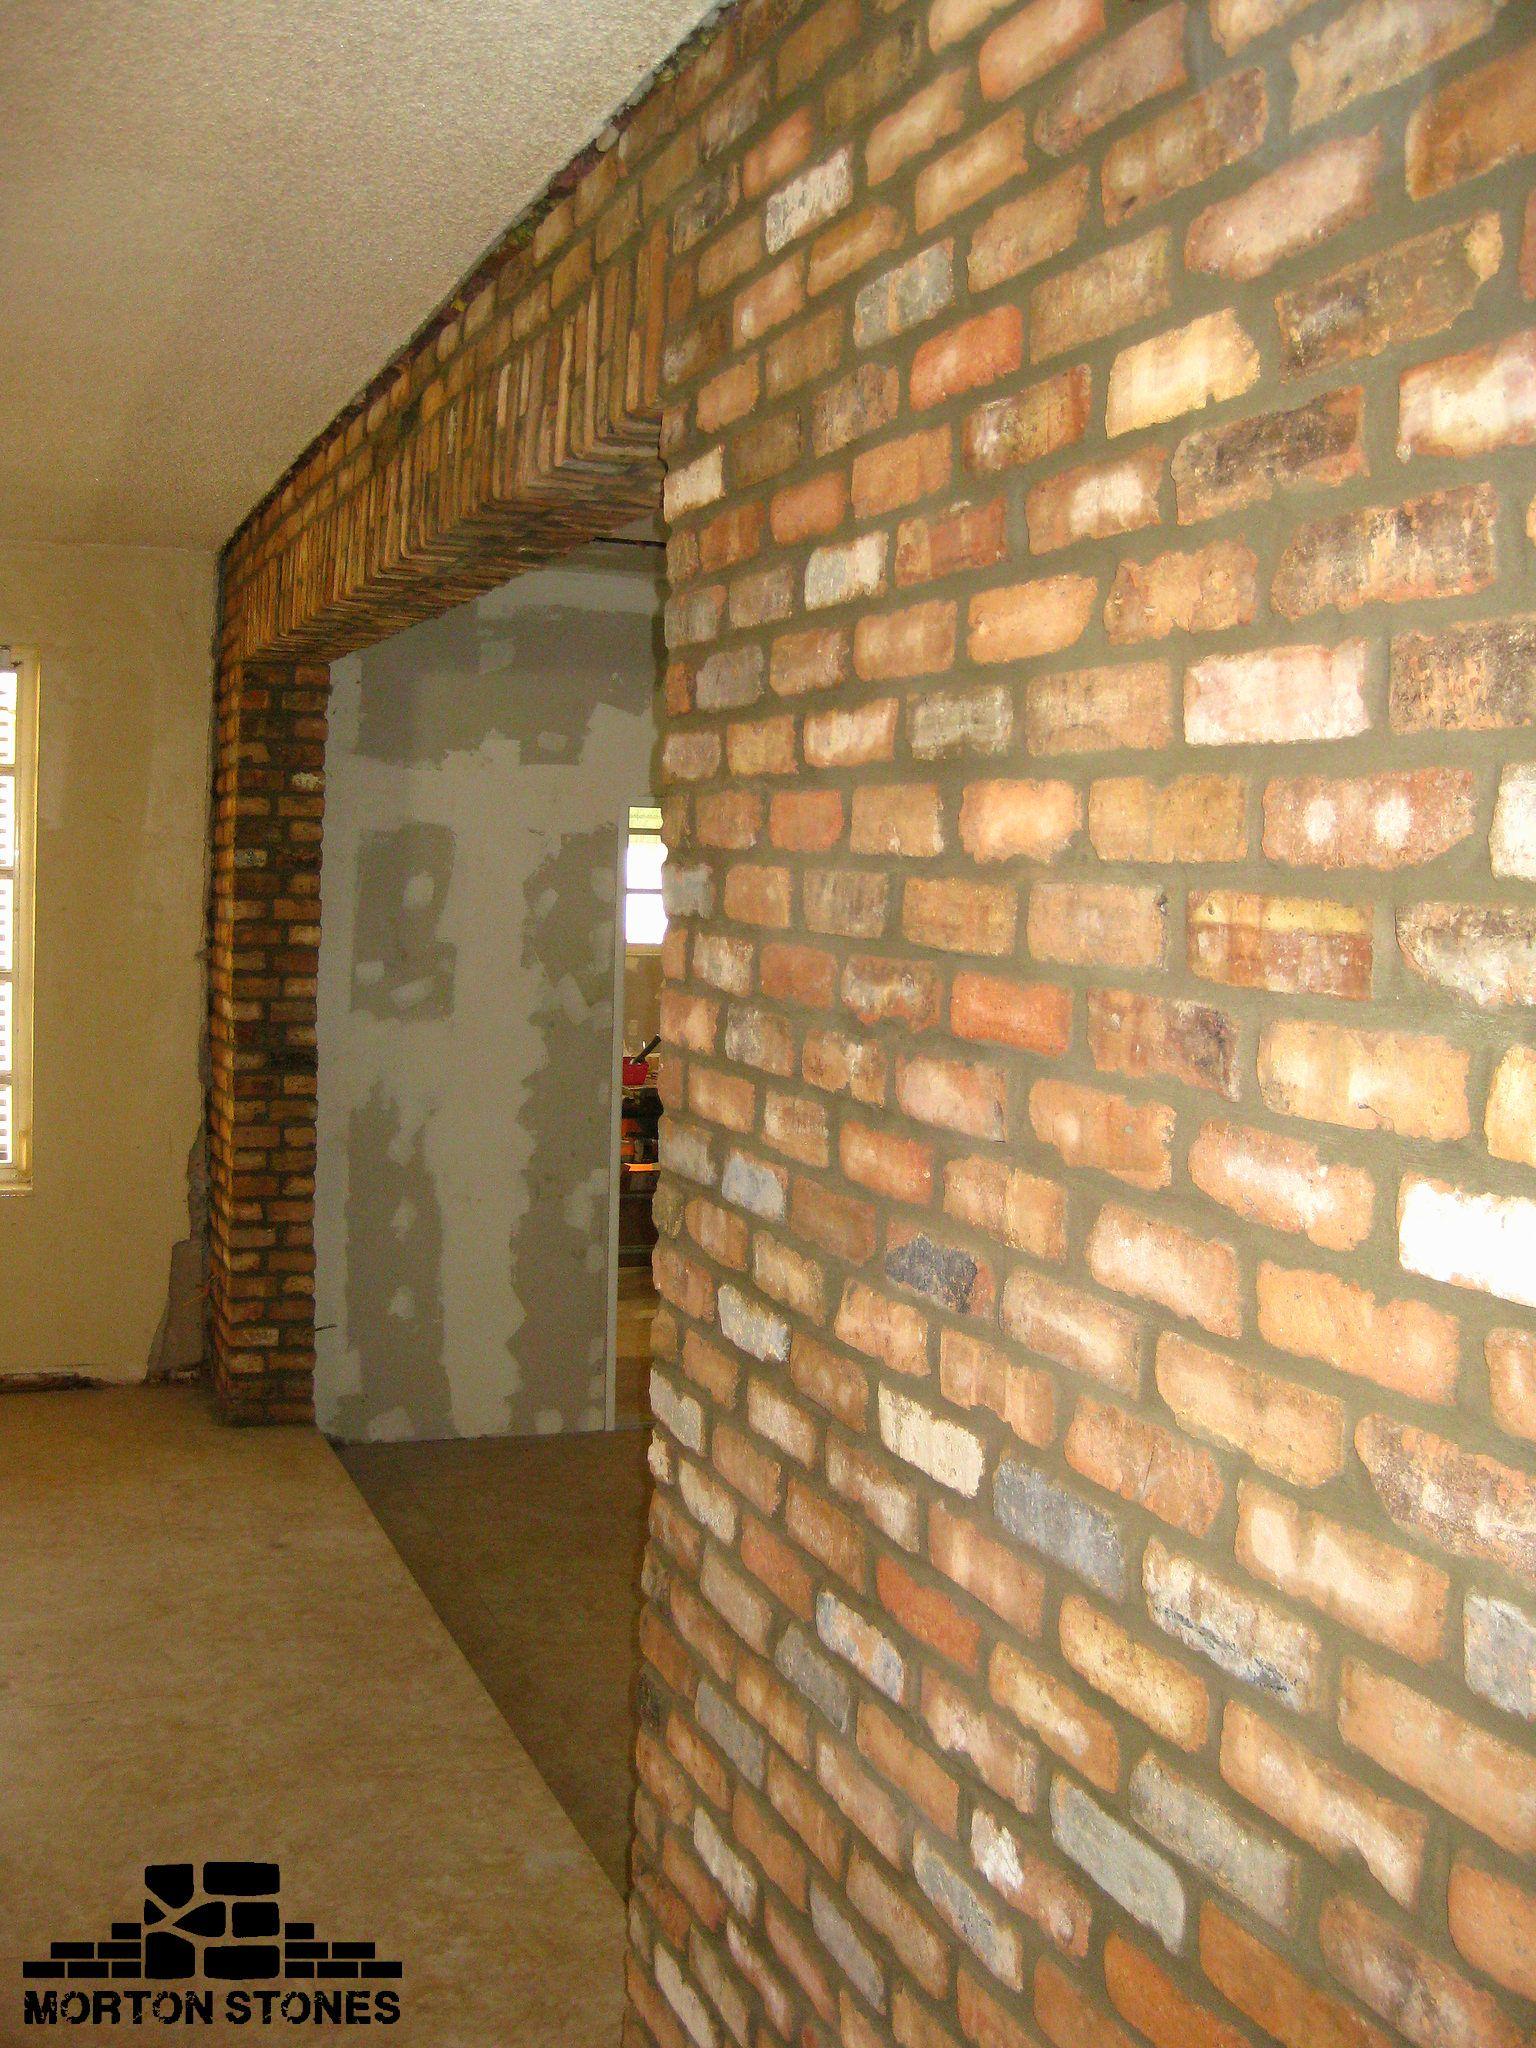 This Is Our Amazing Brick Arch Idea For Your Home Mortonstones Brickwall Rustic Modernhome Decor Interior Br Thin Brick Veneer Brick Veneer Thin Brick